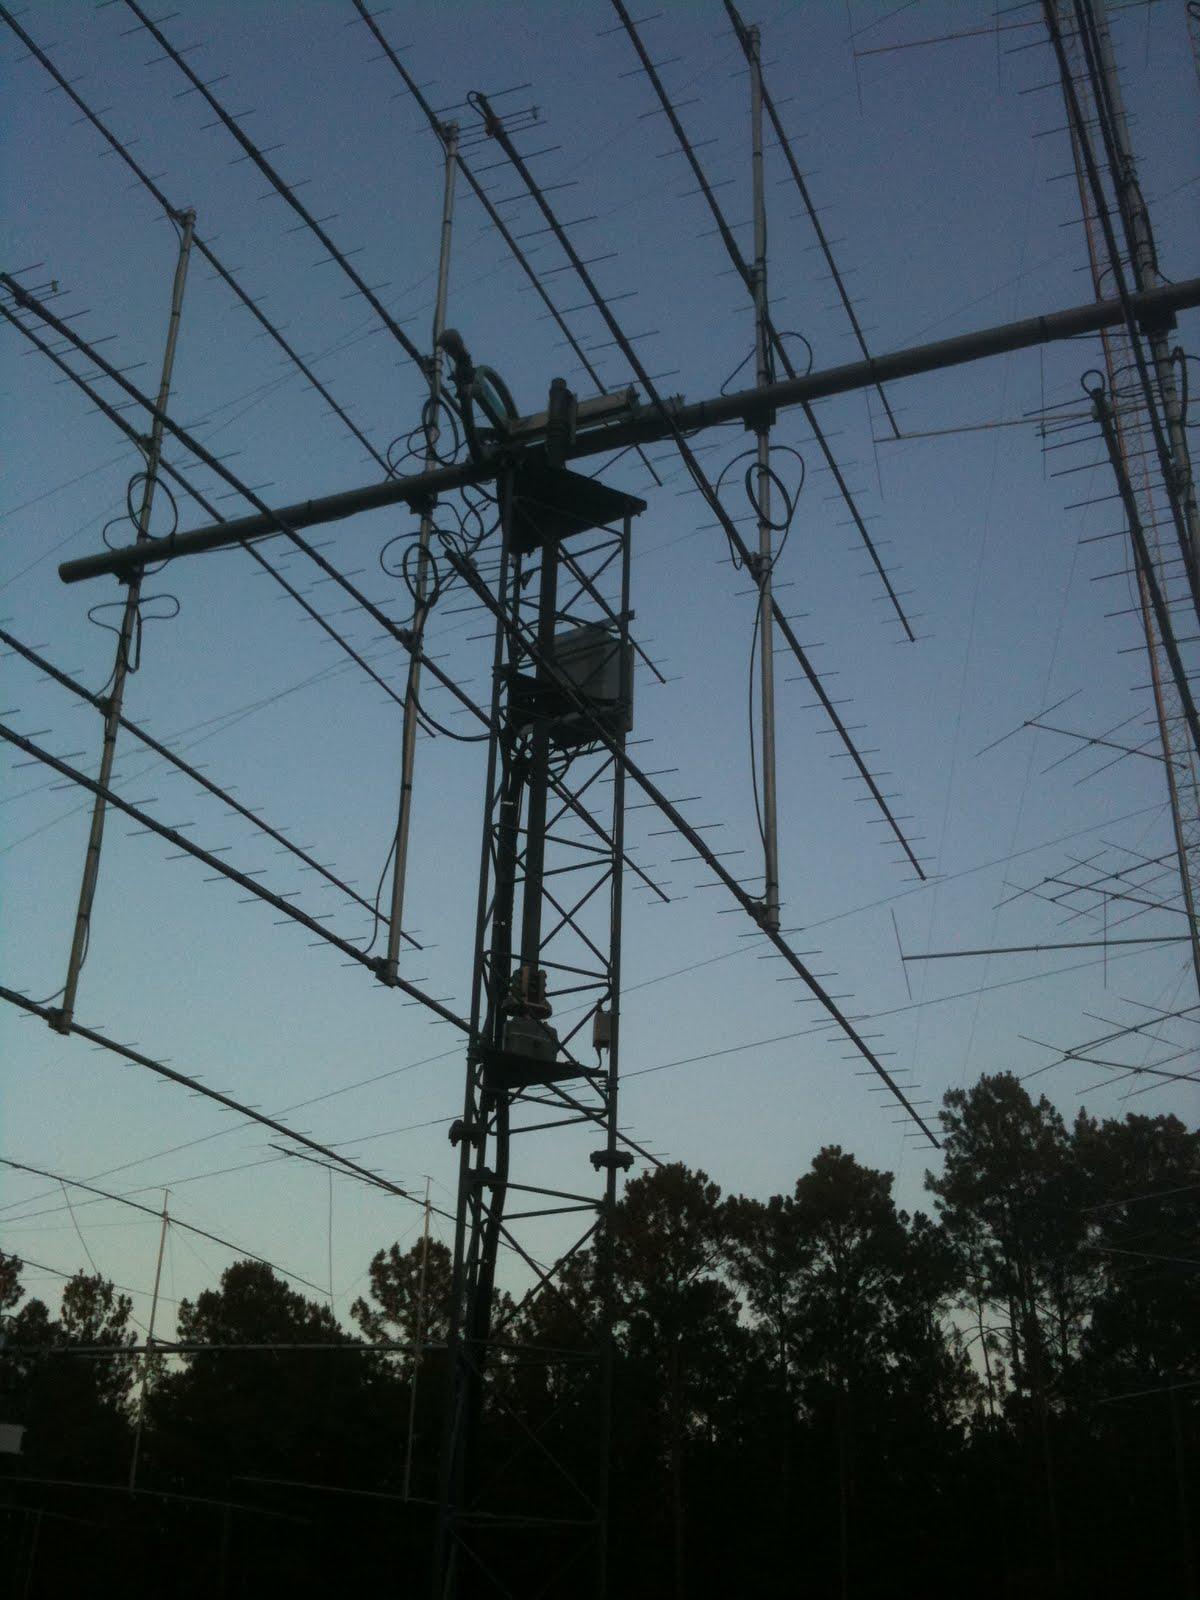 Bill N5YA's HF contest station & Marshall K5QE Vhf/UHF